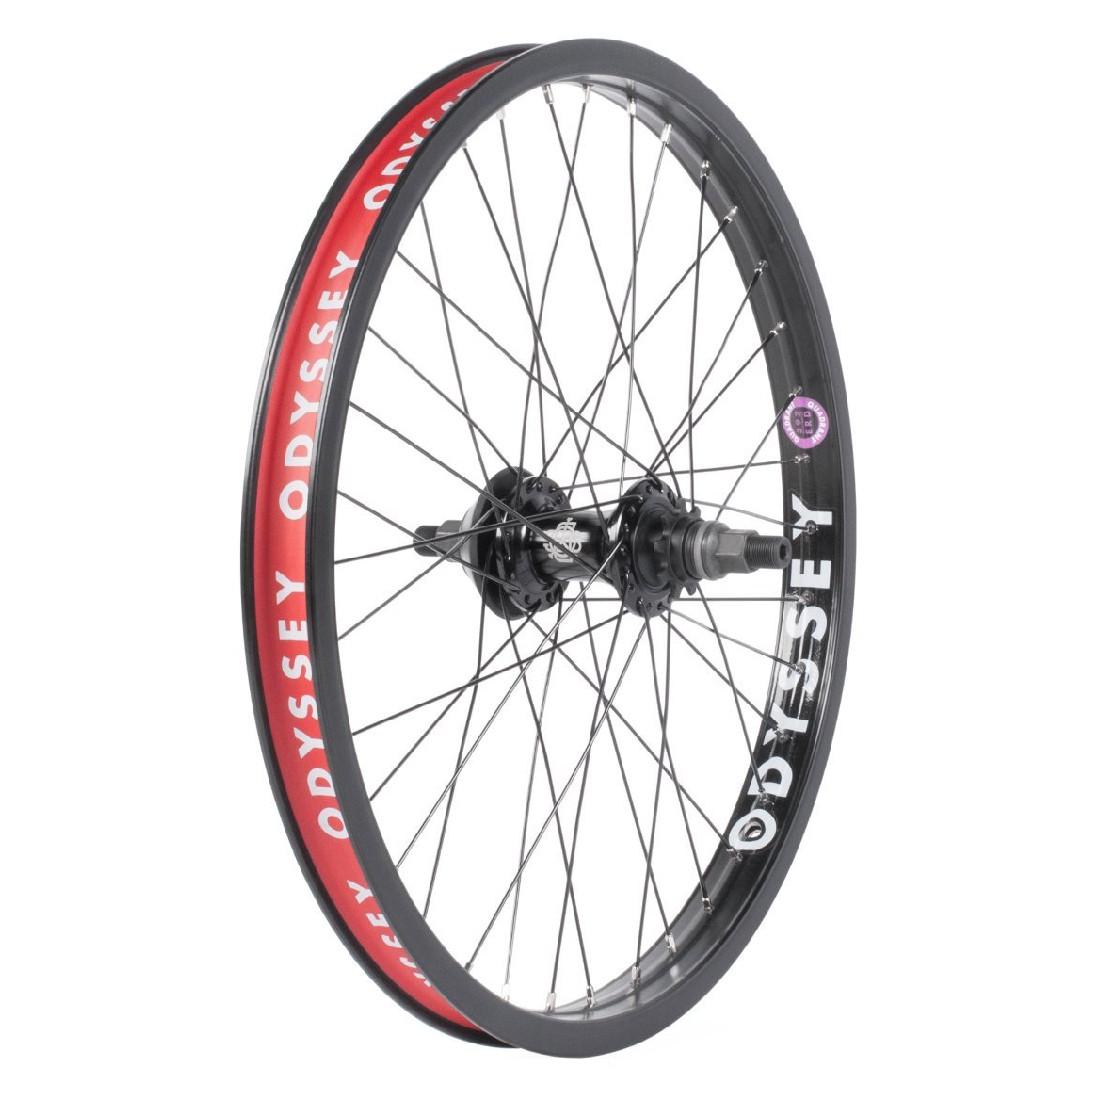 Odyssey - Quadrant C5 Rear Wheel